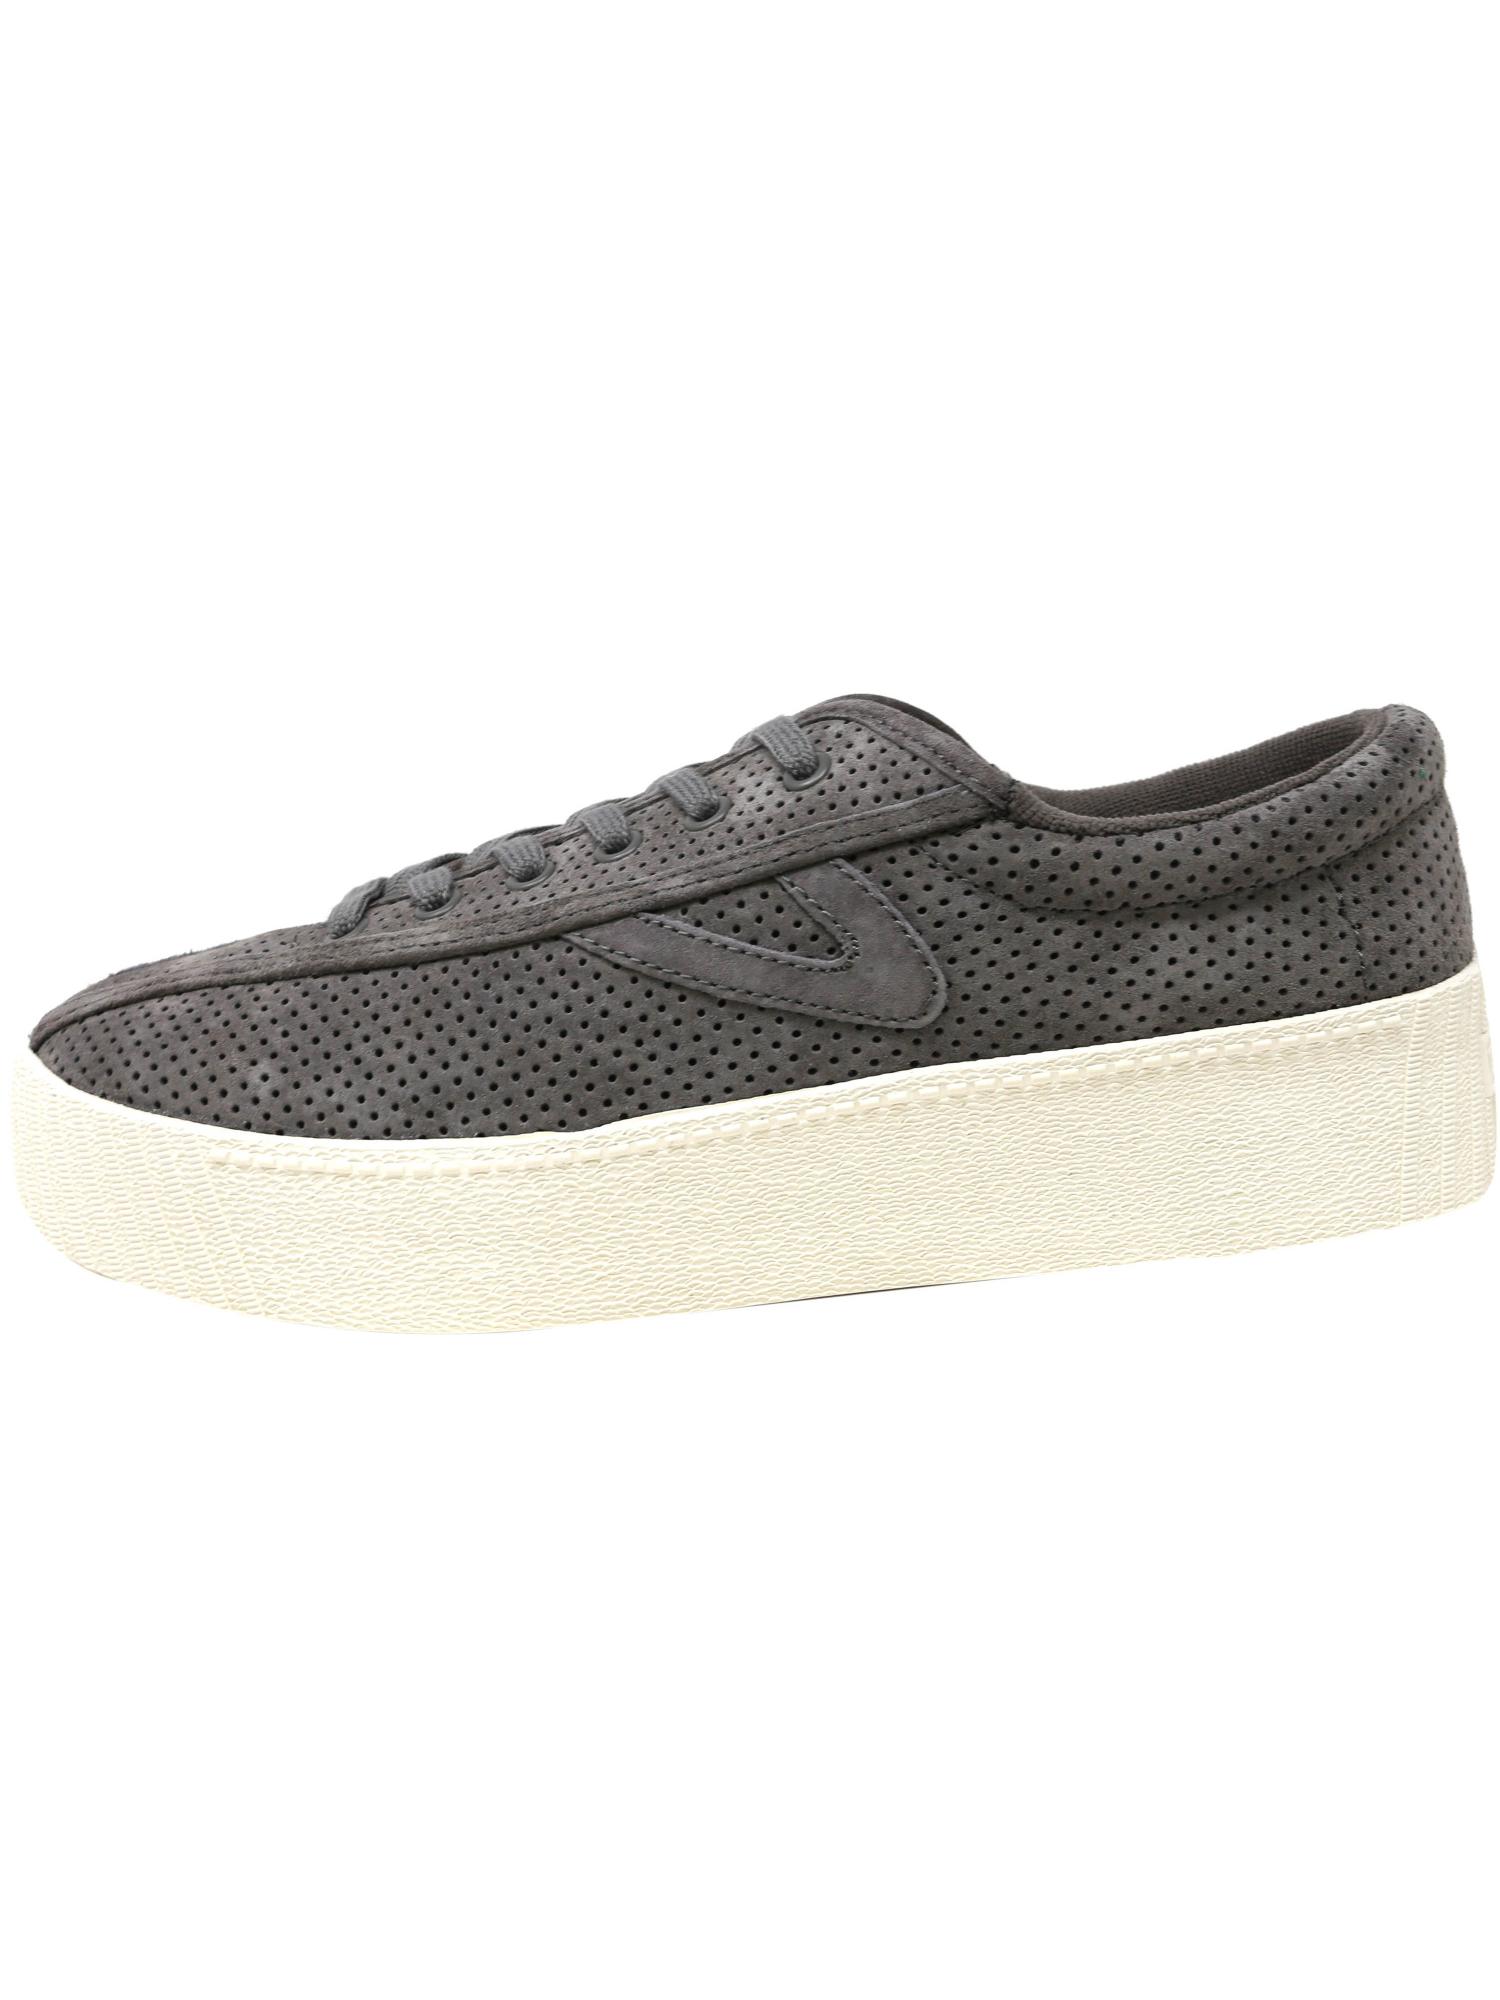 Tretorn-Nylite-3-Bold-Suede-Fashion-Sneaker thumbnail 15